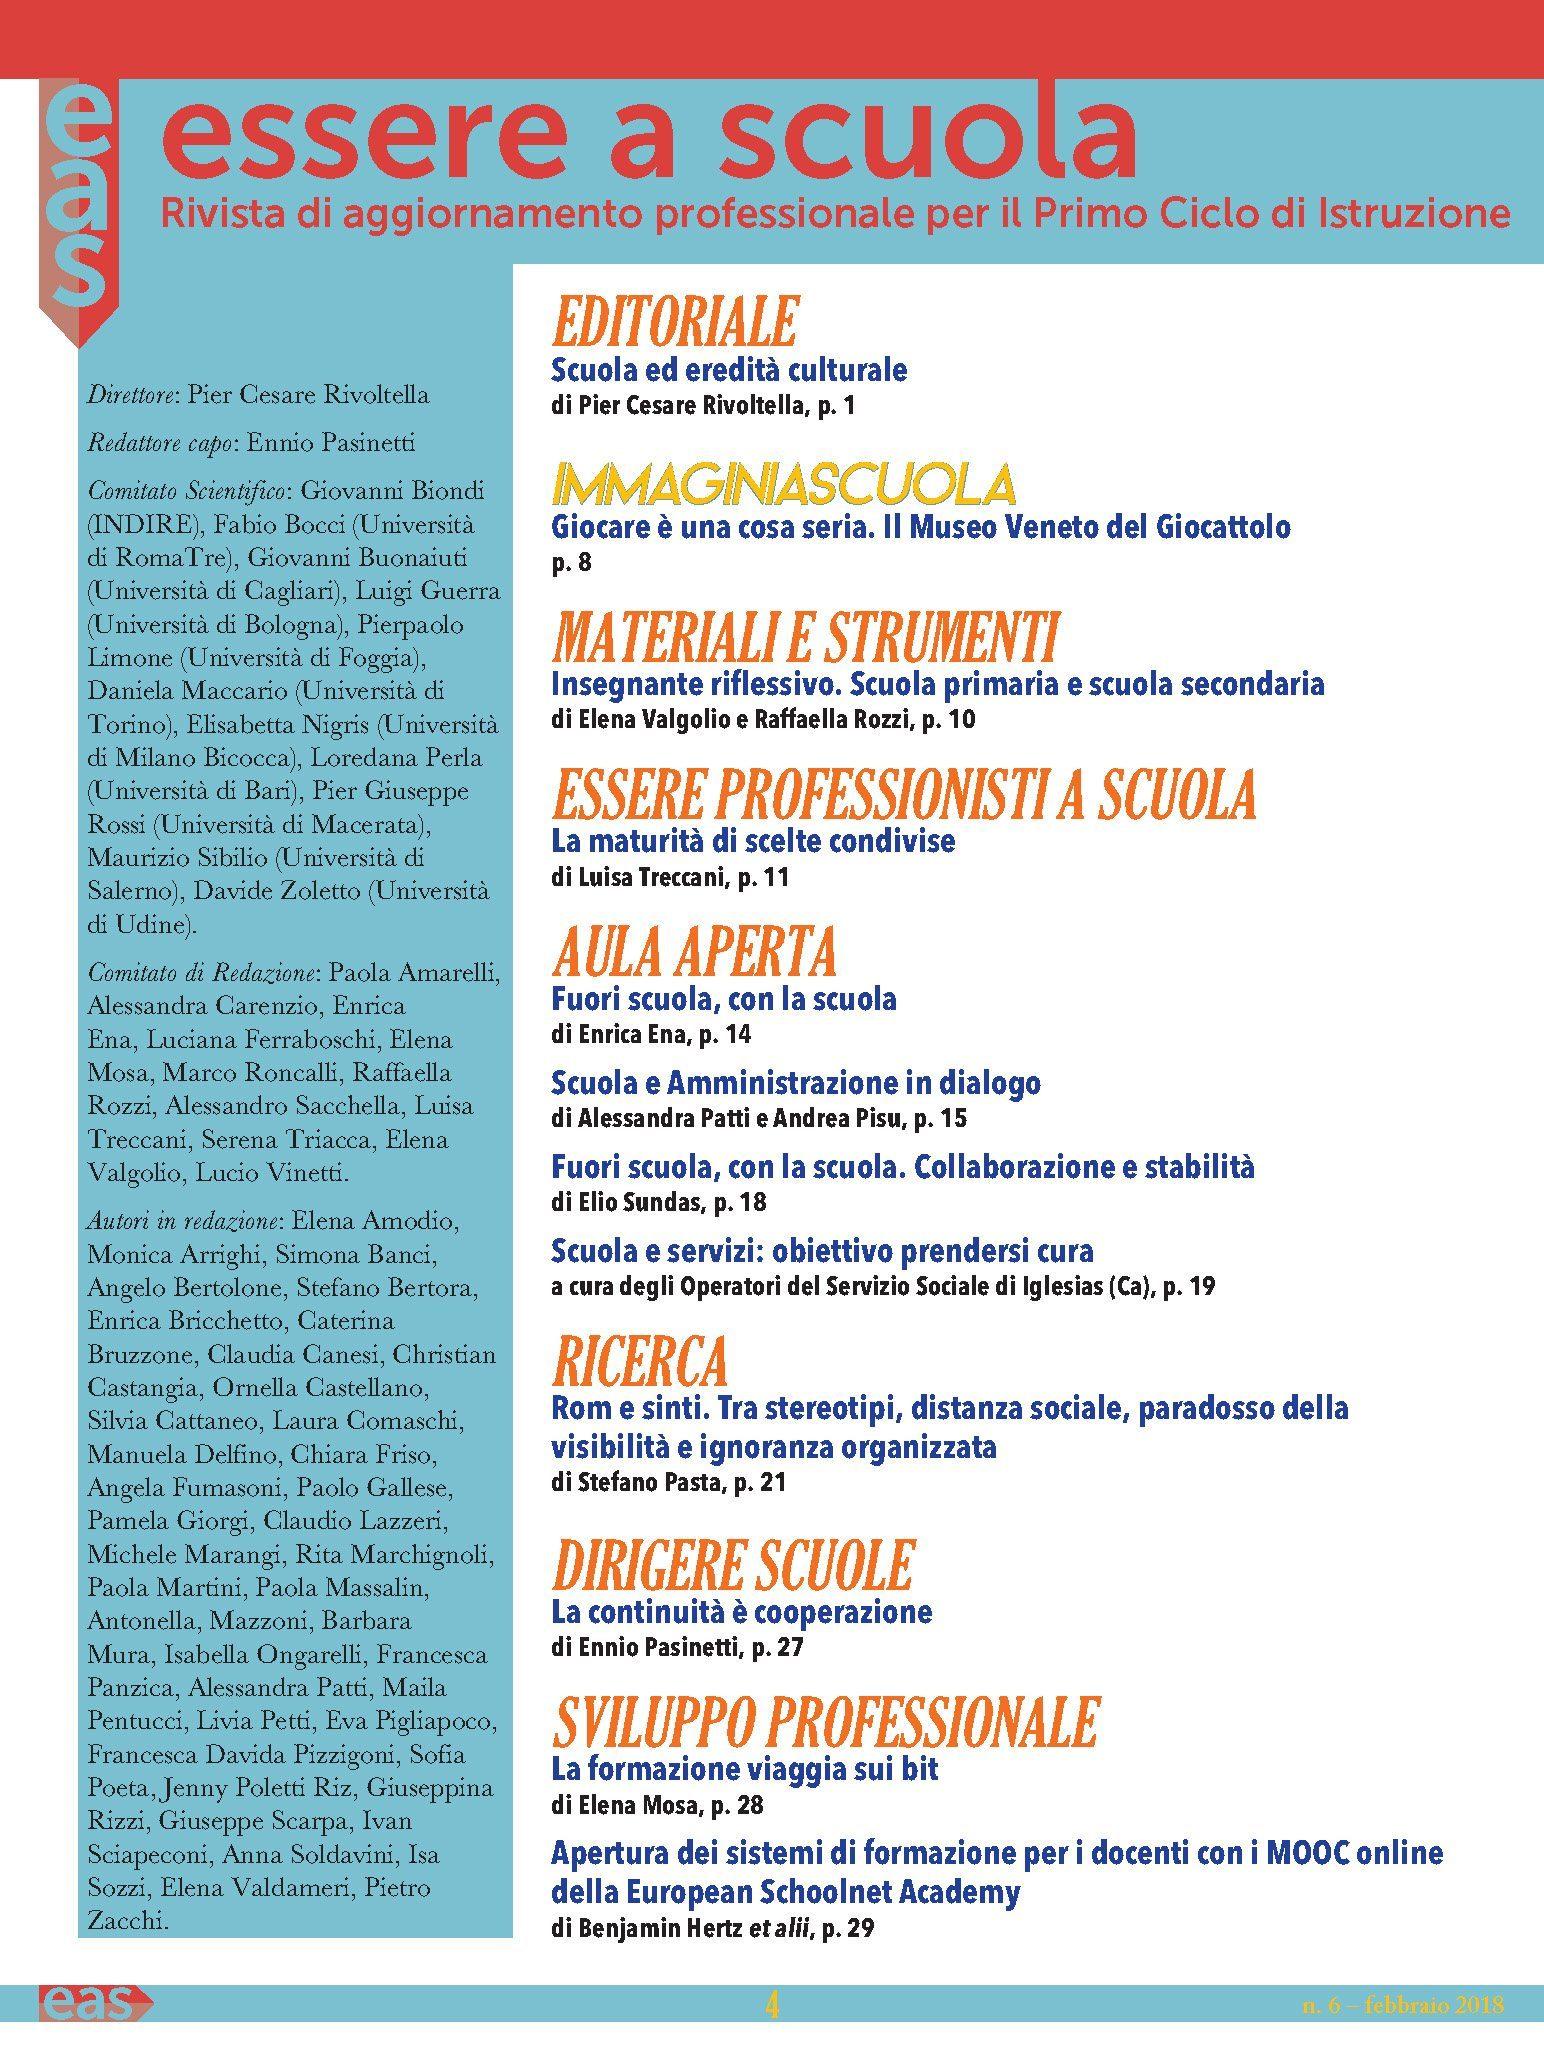 SOMMARIO EAS 6 2018_Pagina_1.jpg